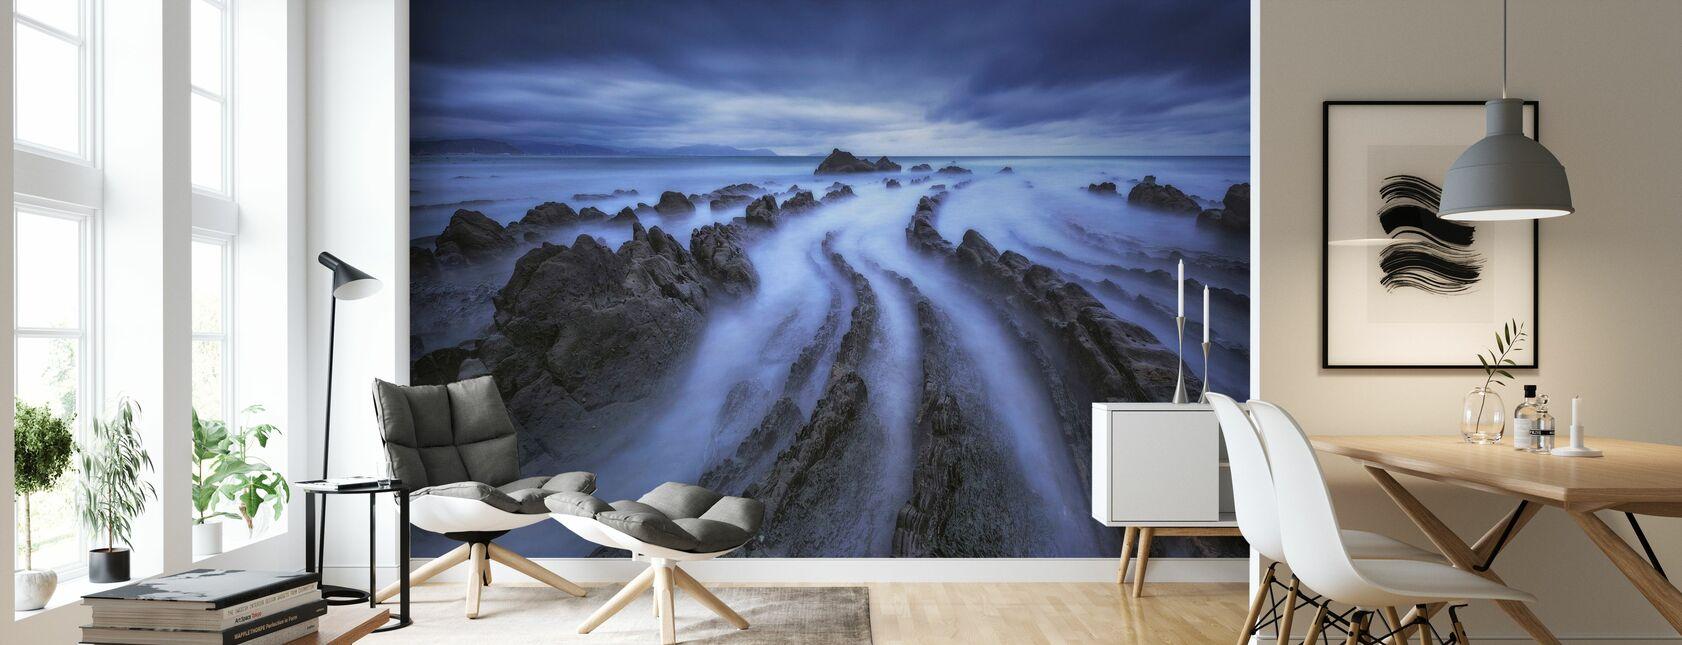 Eternal Lines - Wallpaper - Living Room